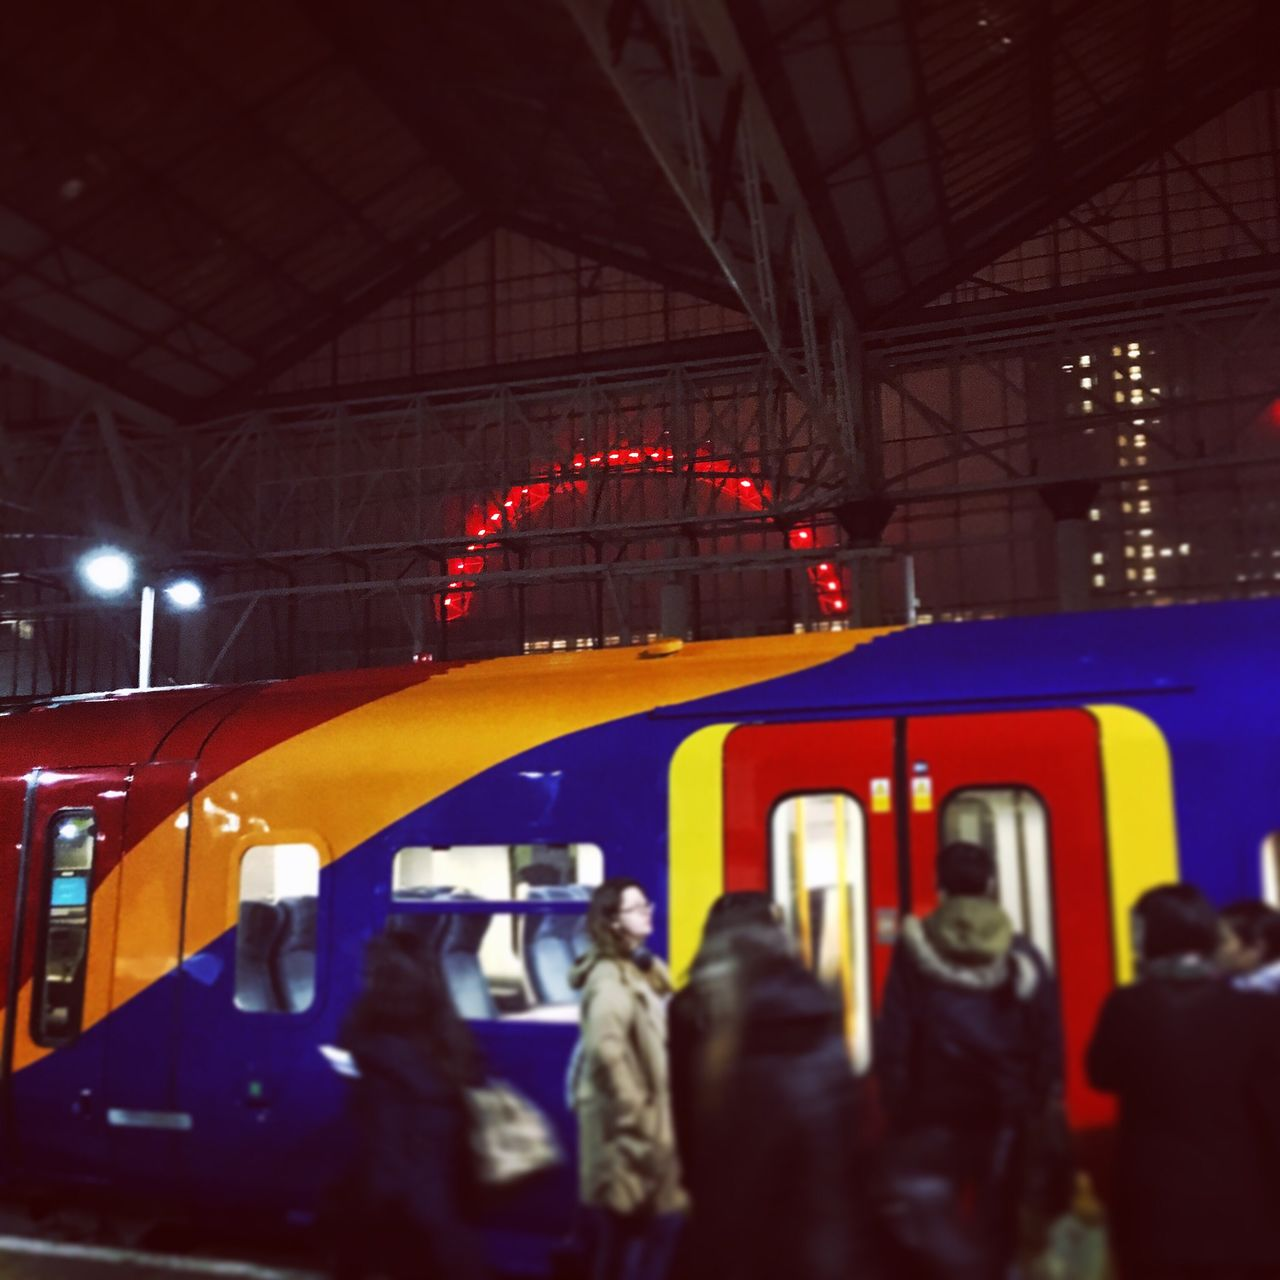 public transportation, train - vehicle, illuminated, transportation, red, real people, rail transportation, built structure, night, men, women, architecture, sky, outdoors, people